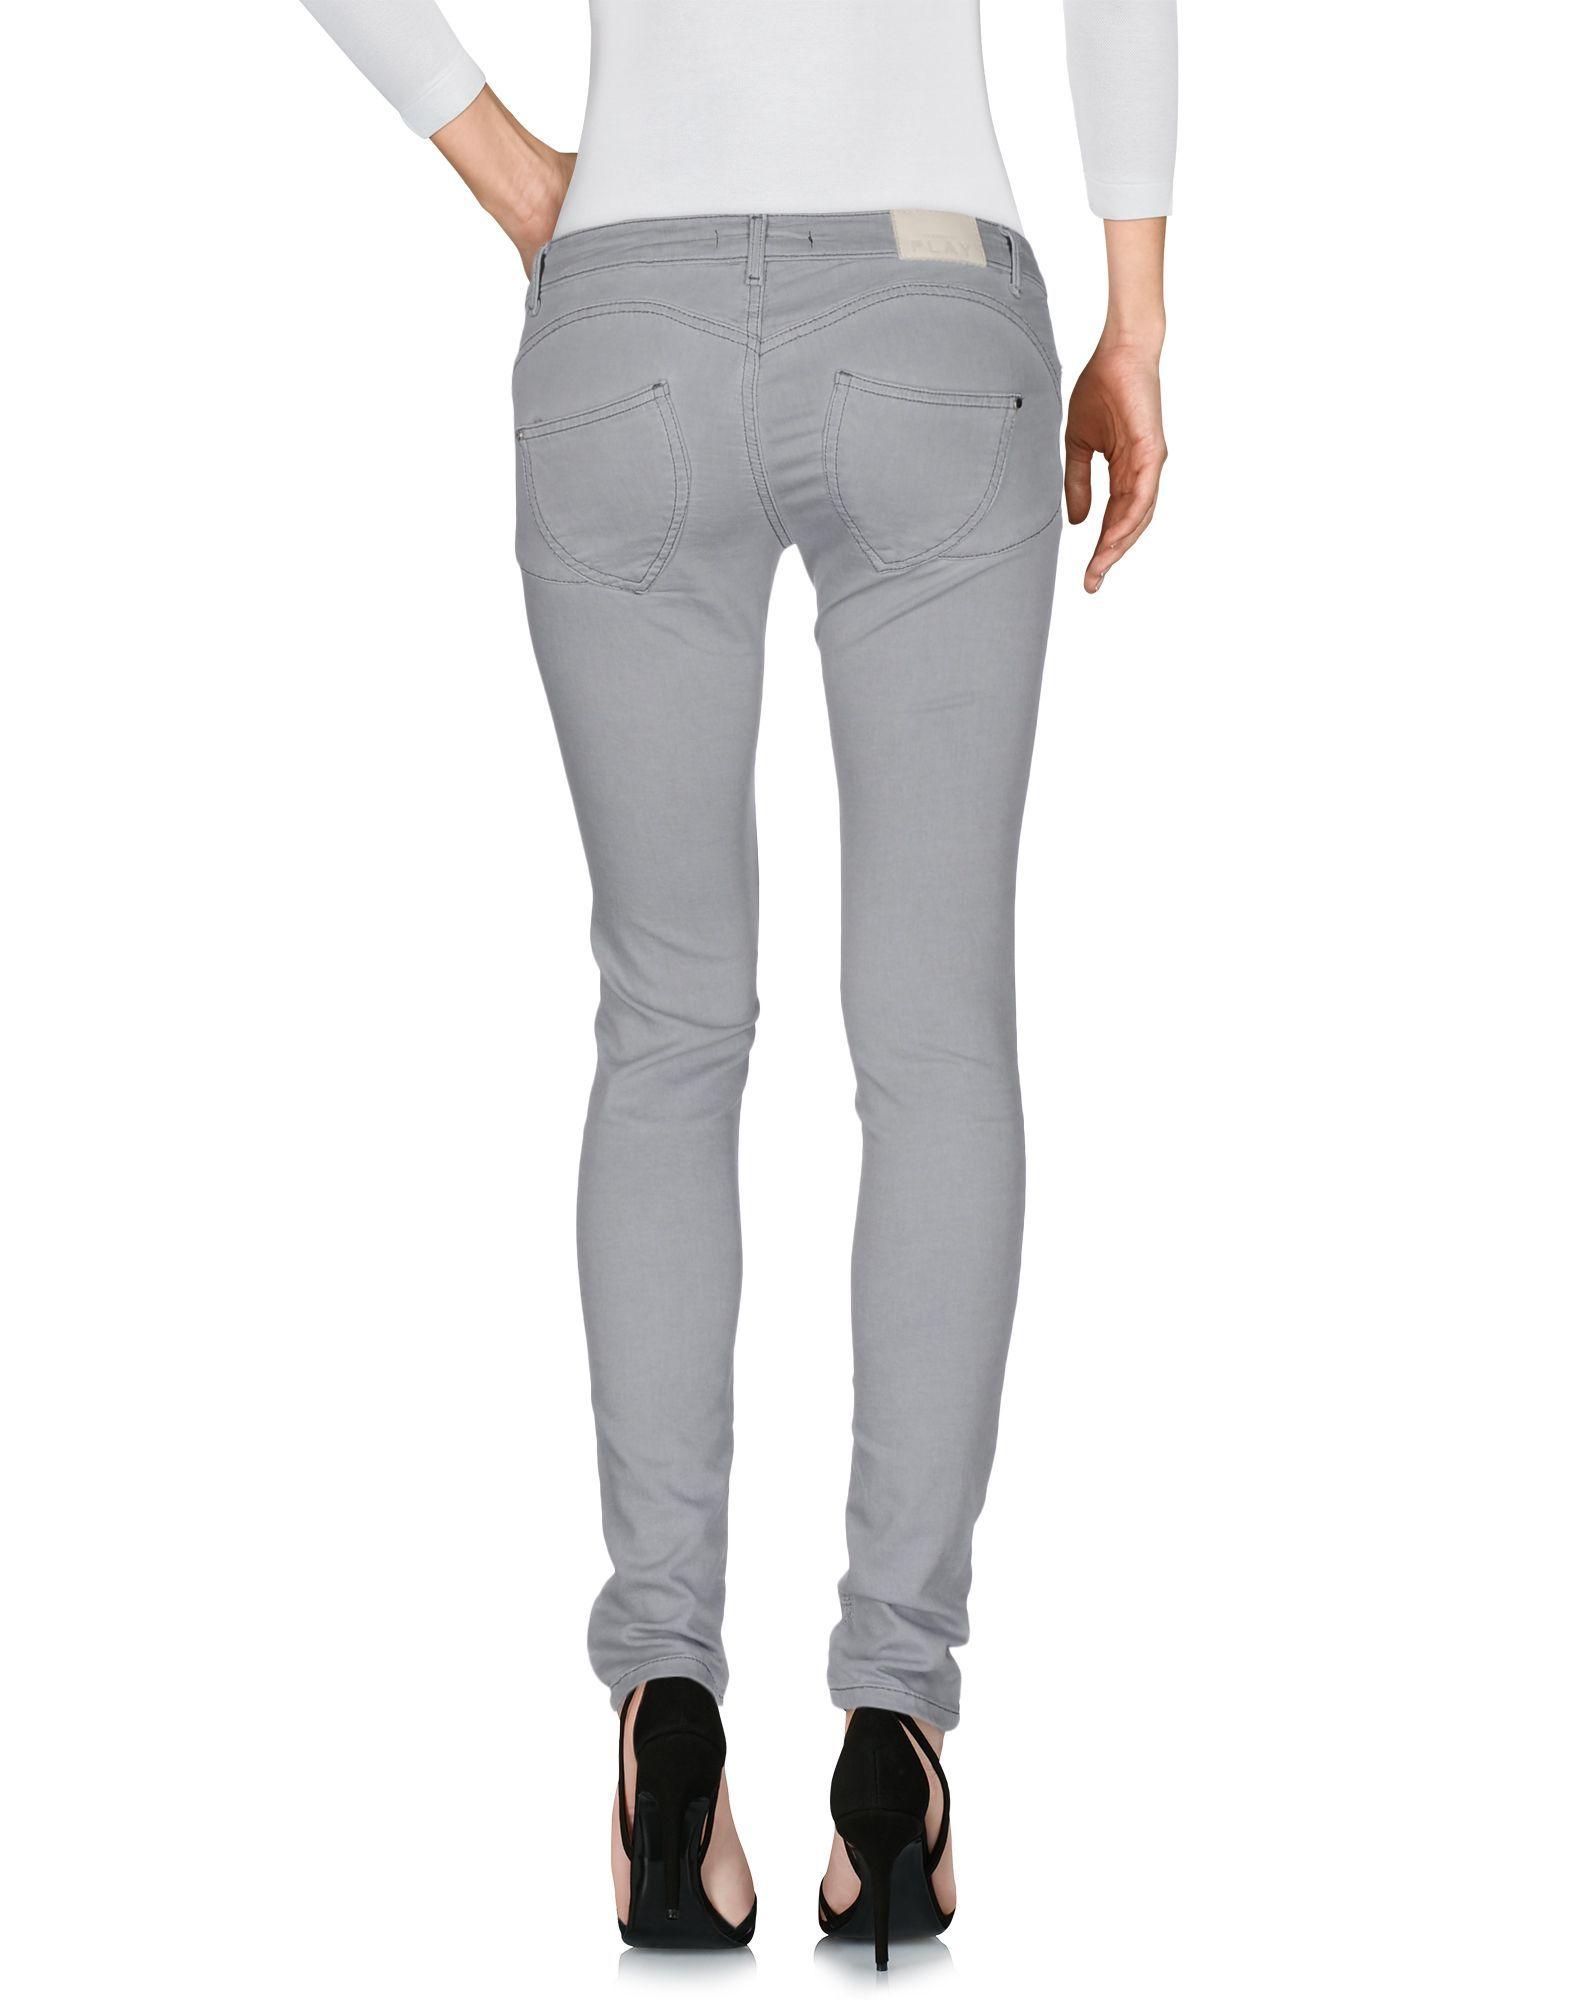 Carrera Grey Denim Jeans